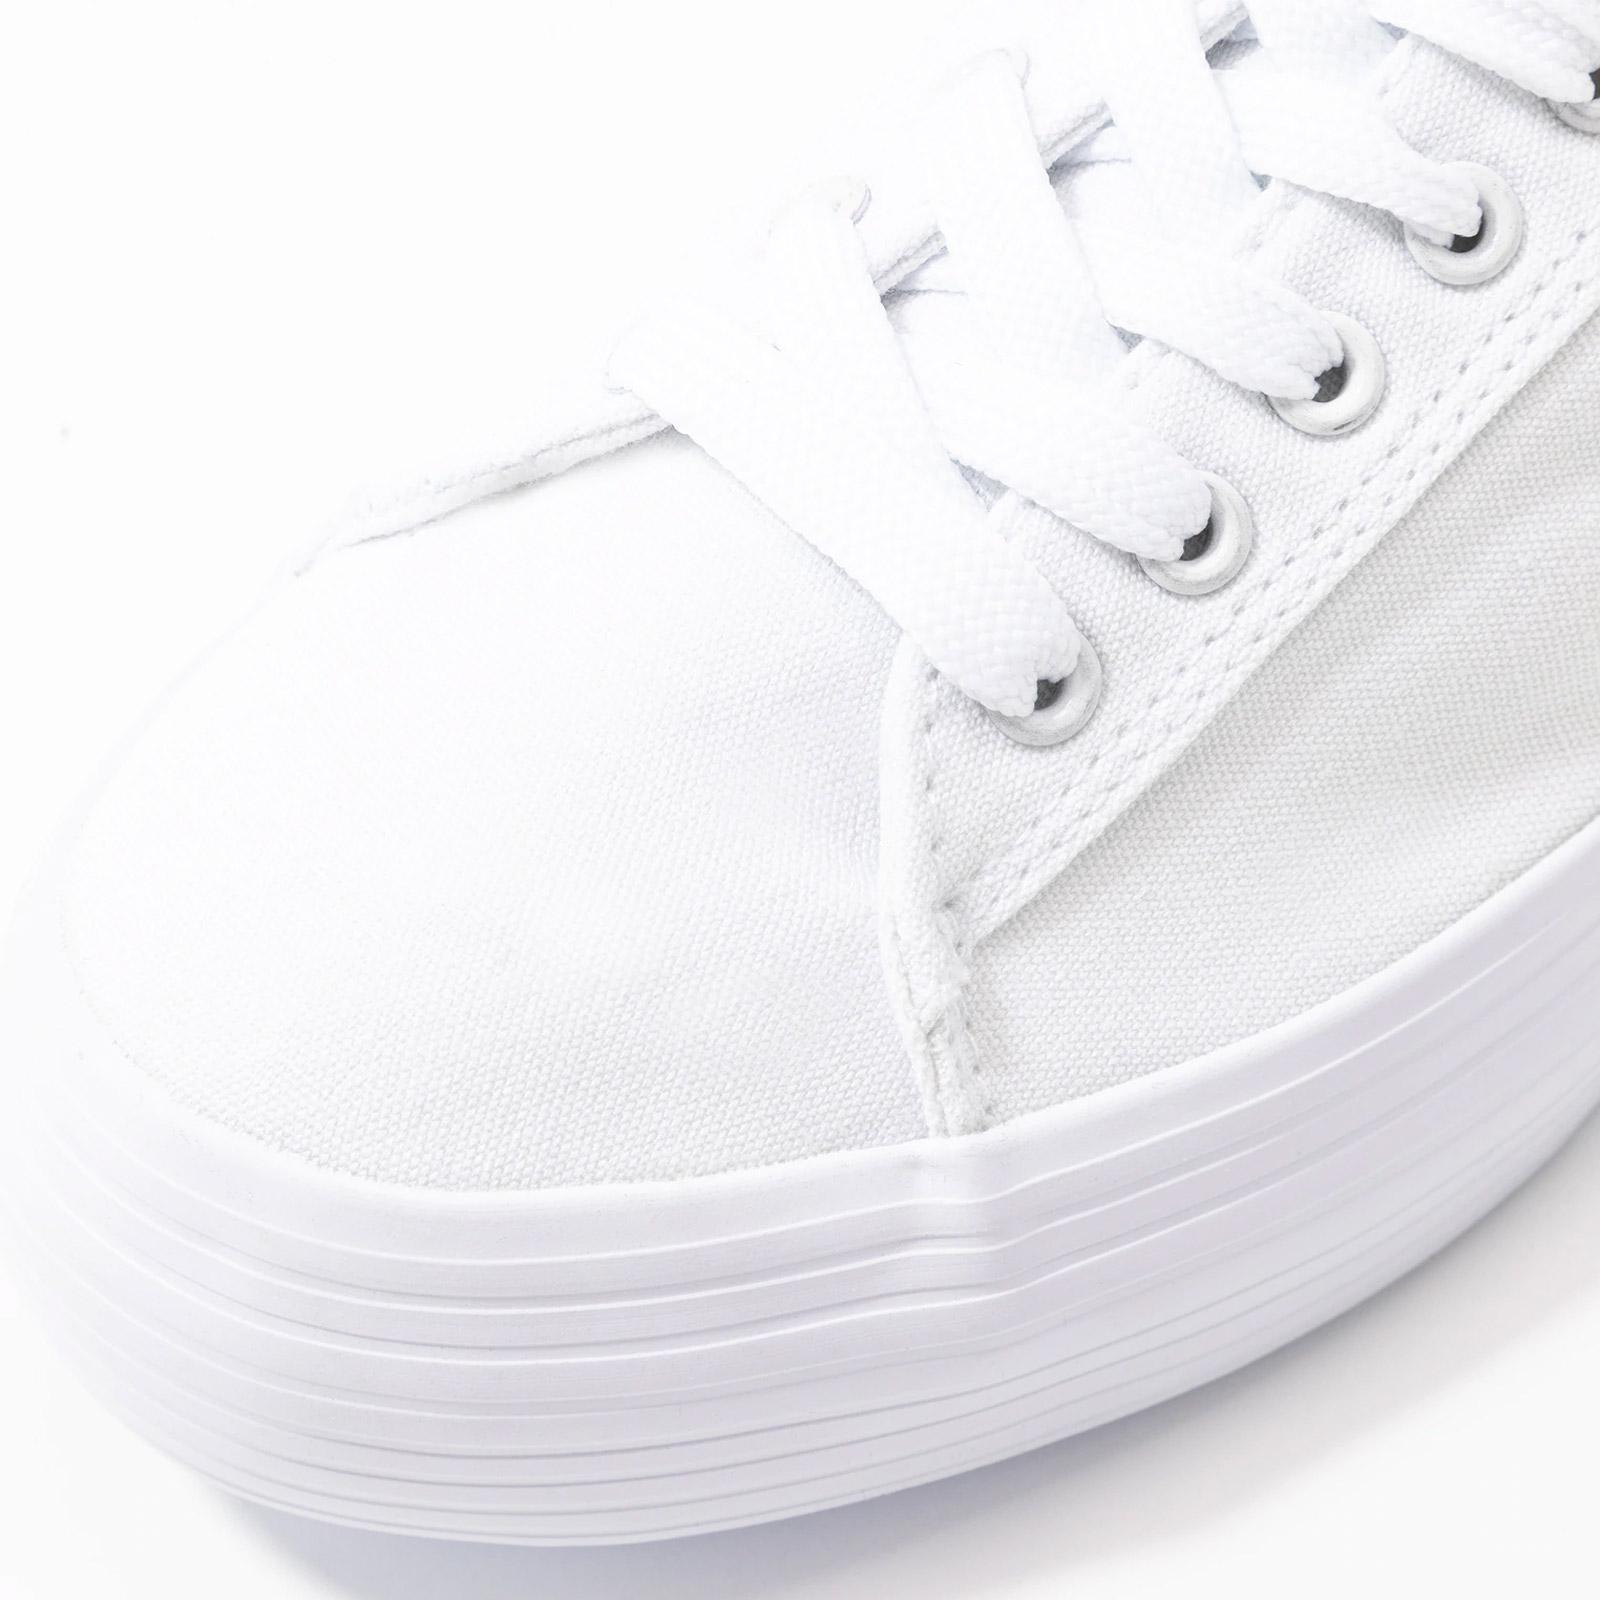 EX STORE Ladies Womens Plain White